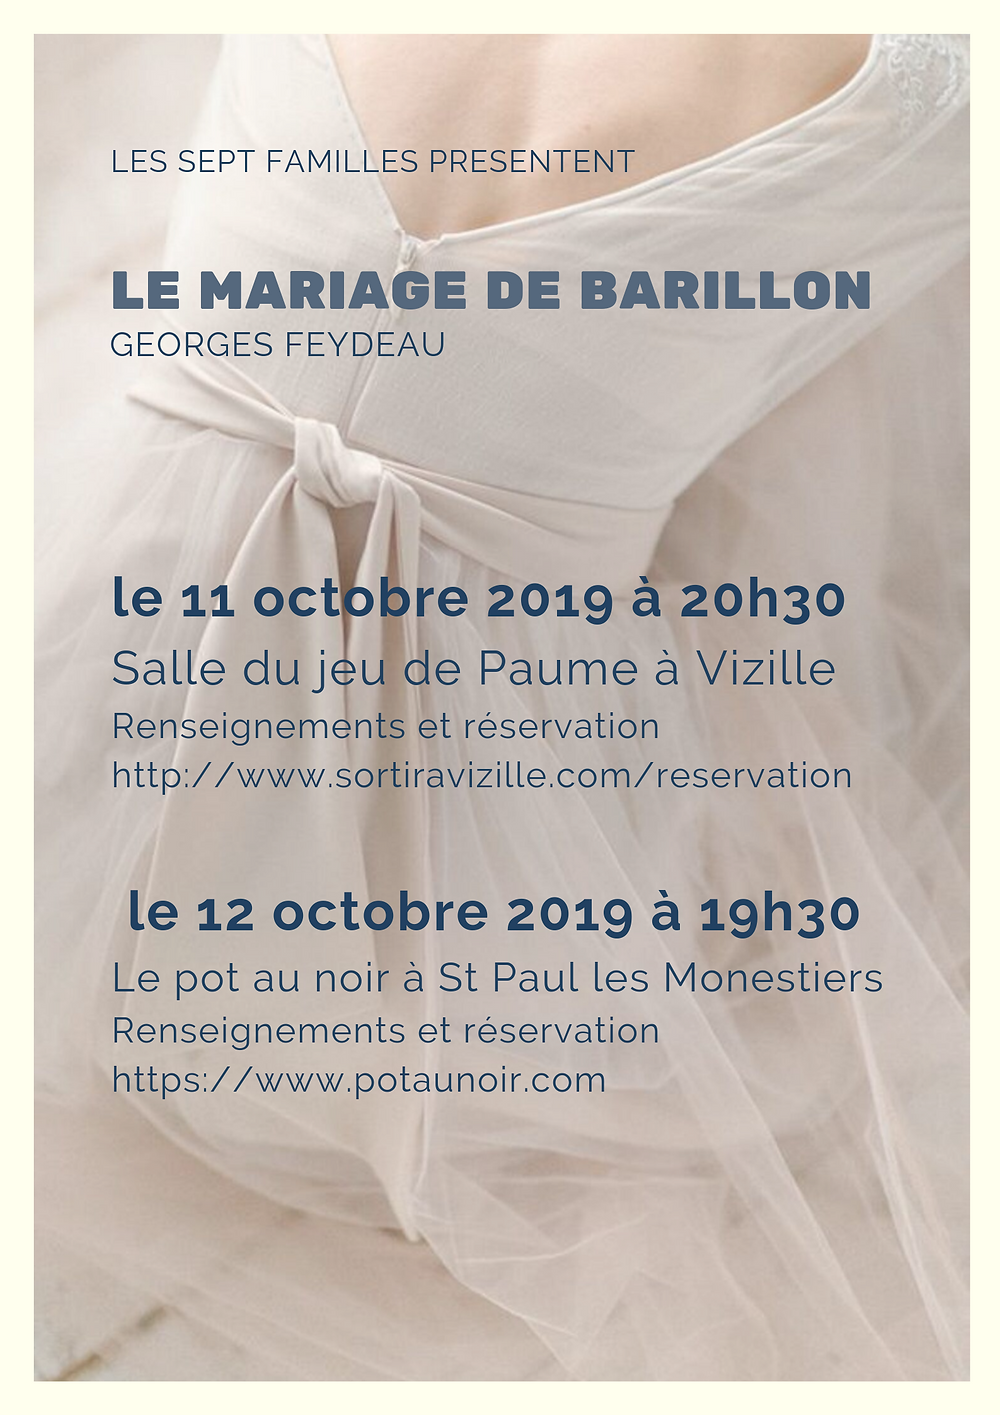 Le mariage de Barillon Feydeau création